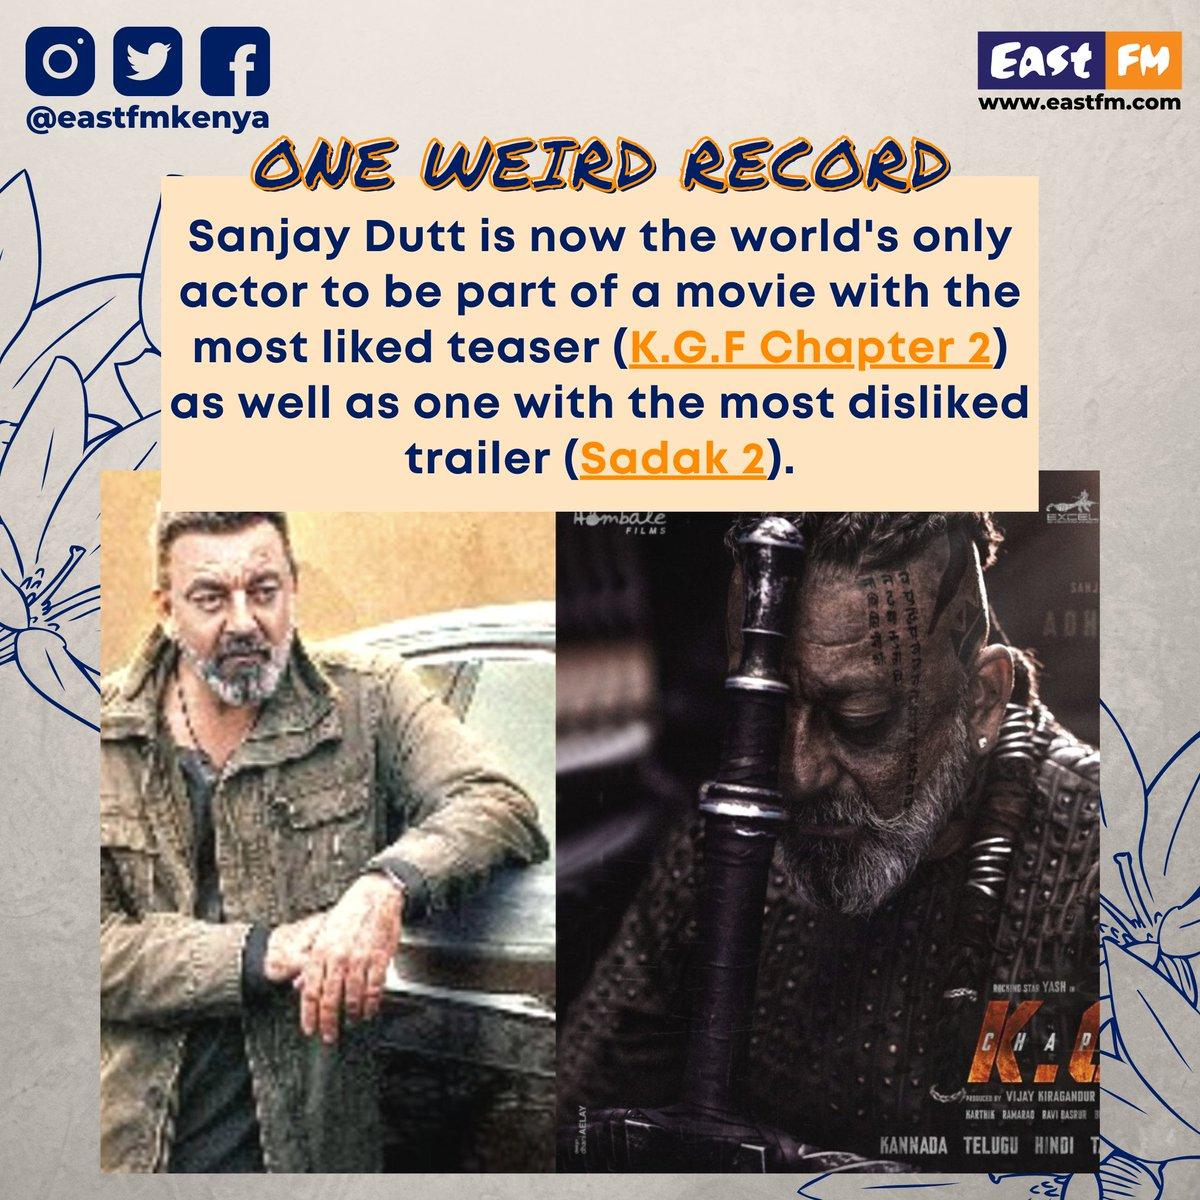 #SanjayDutt is now the world's only #actor to be part of a #movie with the most liked teaser (K.G.F Chapter 2) as well as one with the most disliked trailer (Sadak 2). • • • • #KGFChapter2 #KGF #Sadak2 #Sadak #Sanjay #Dutt #SanjayDuttFans #Bollywood #EastFM